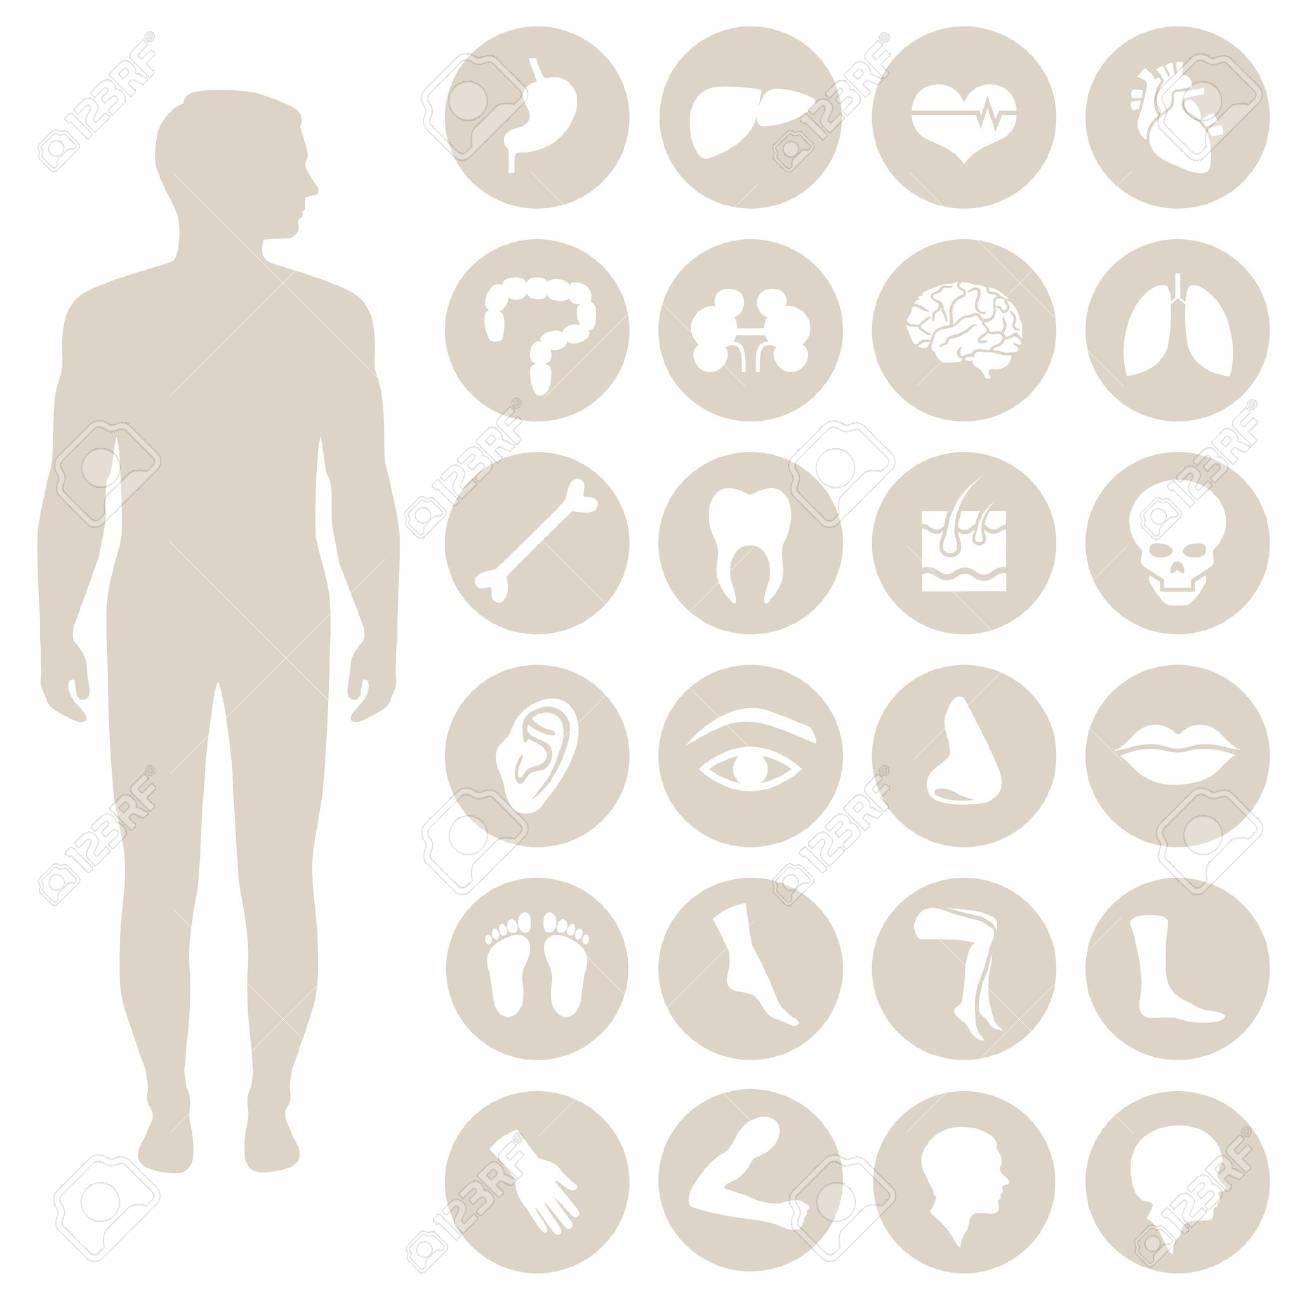 Anatomy Human Body Parts, Organs Vector Medical Icon, Royalty Free ...